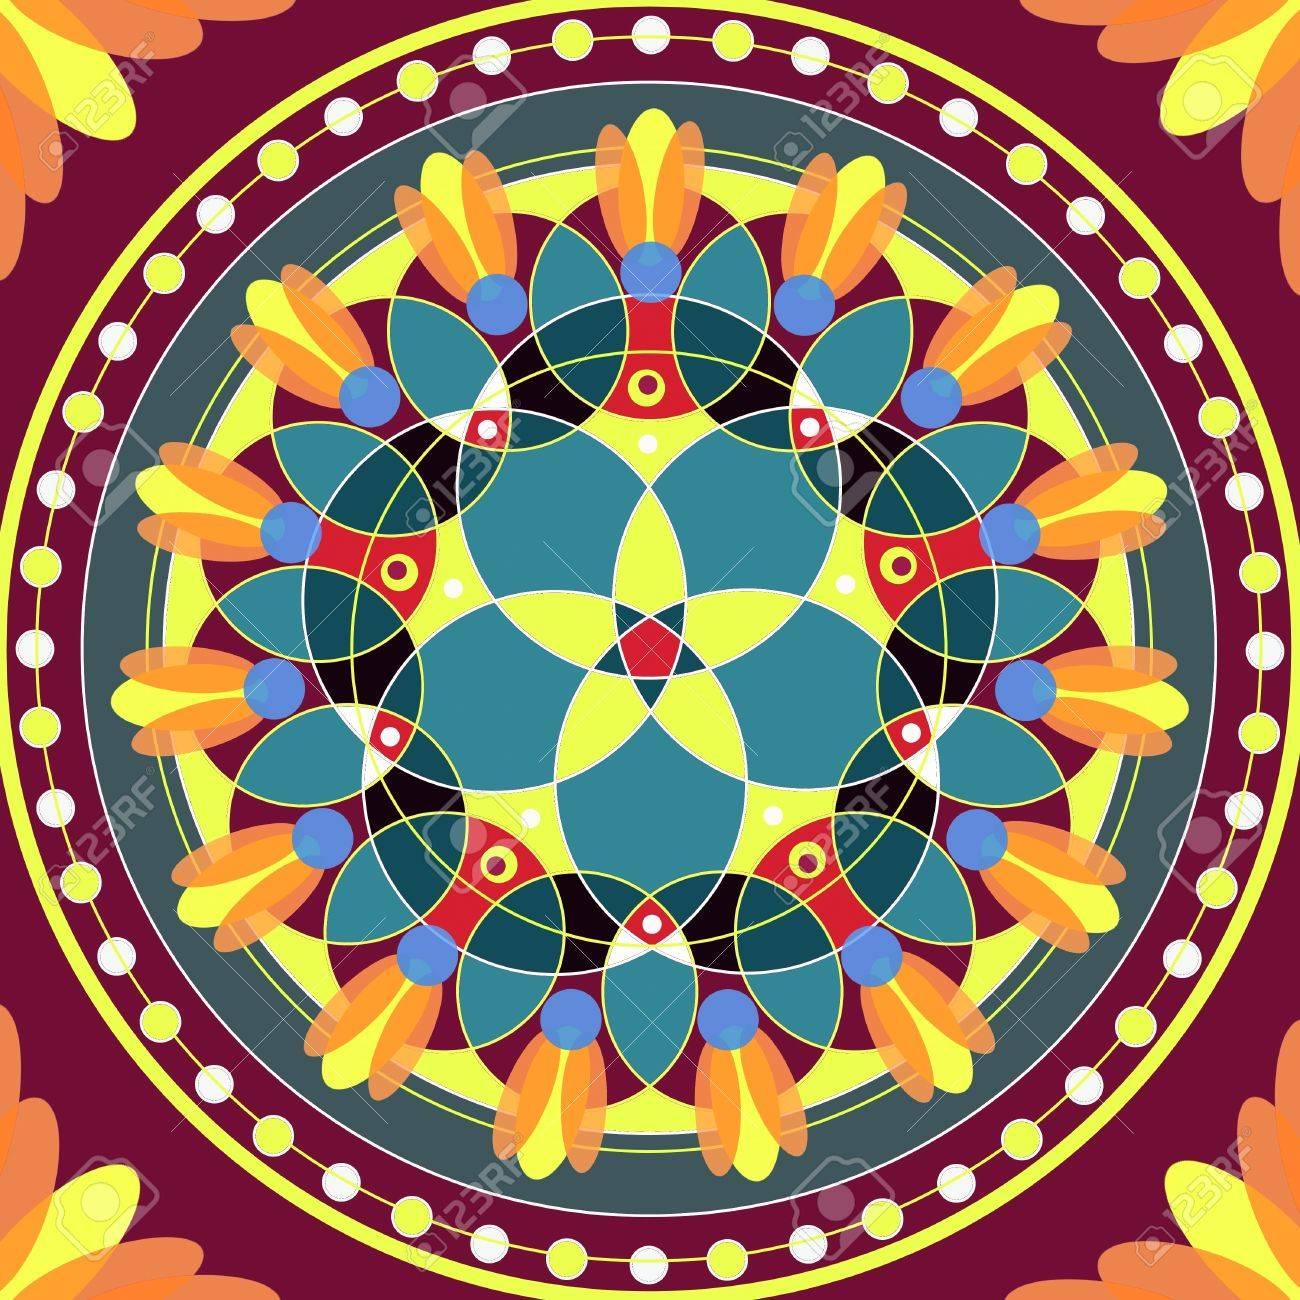 Mandala circular abstract pattern colorful floral kaleidoscopic image background Stock Photo - 13002427